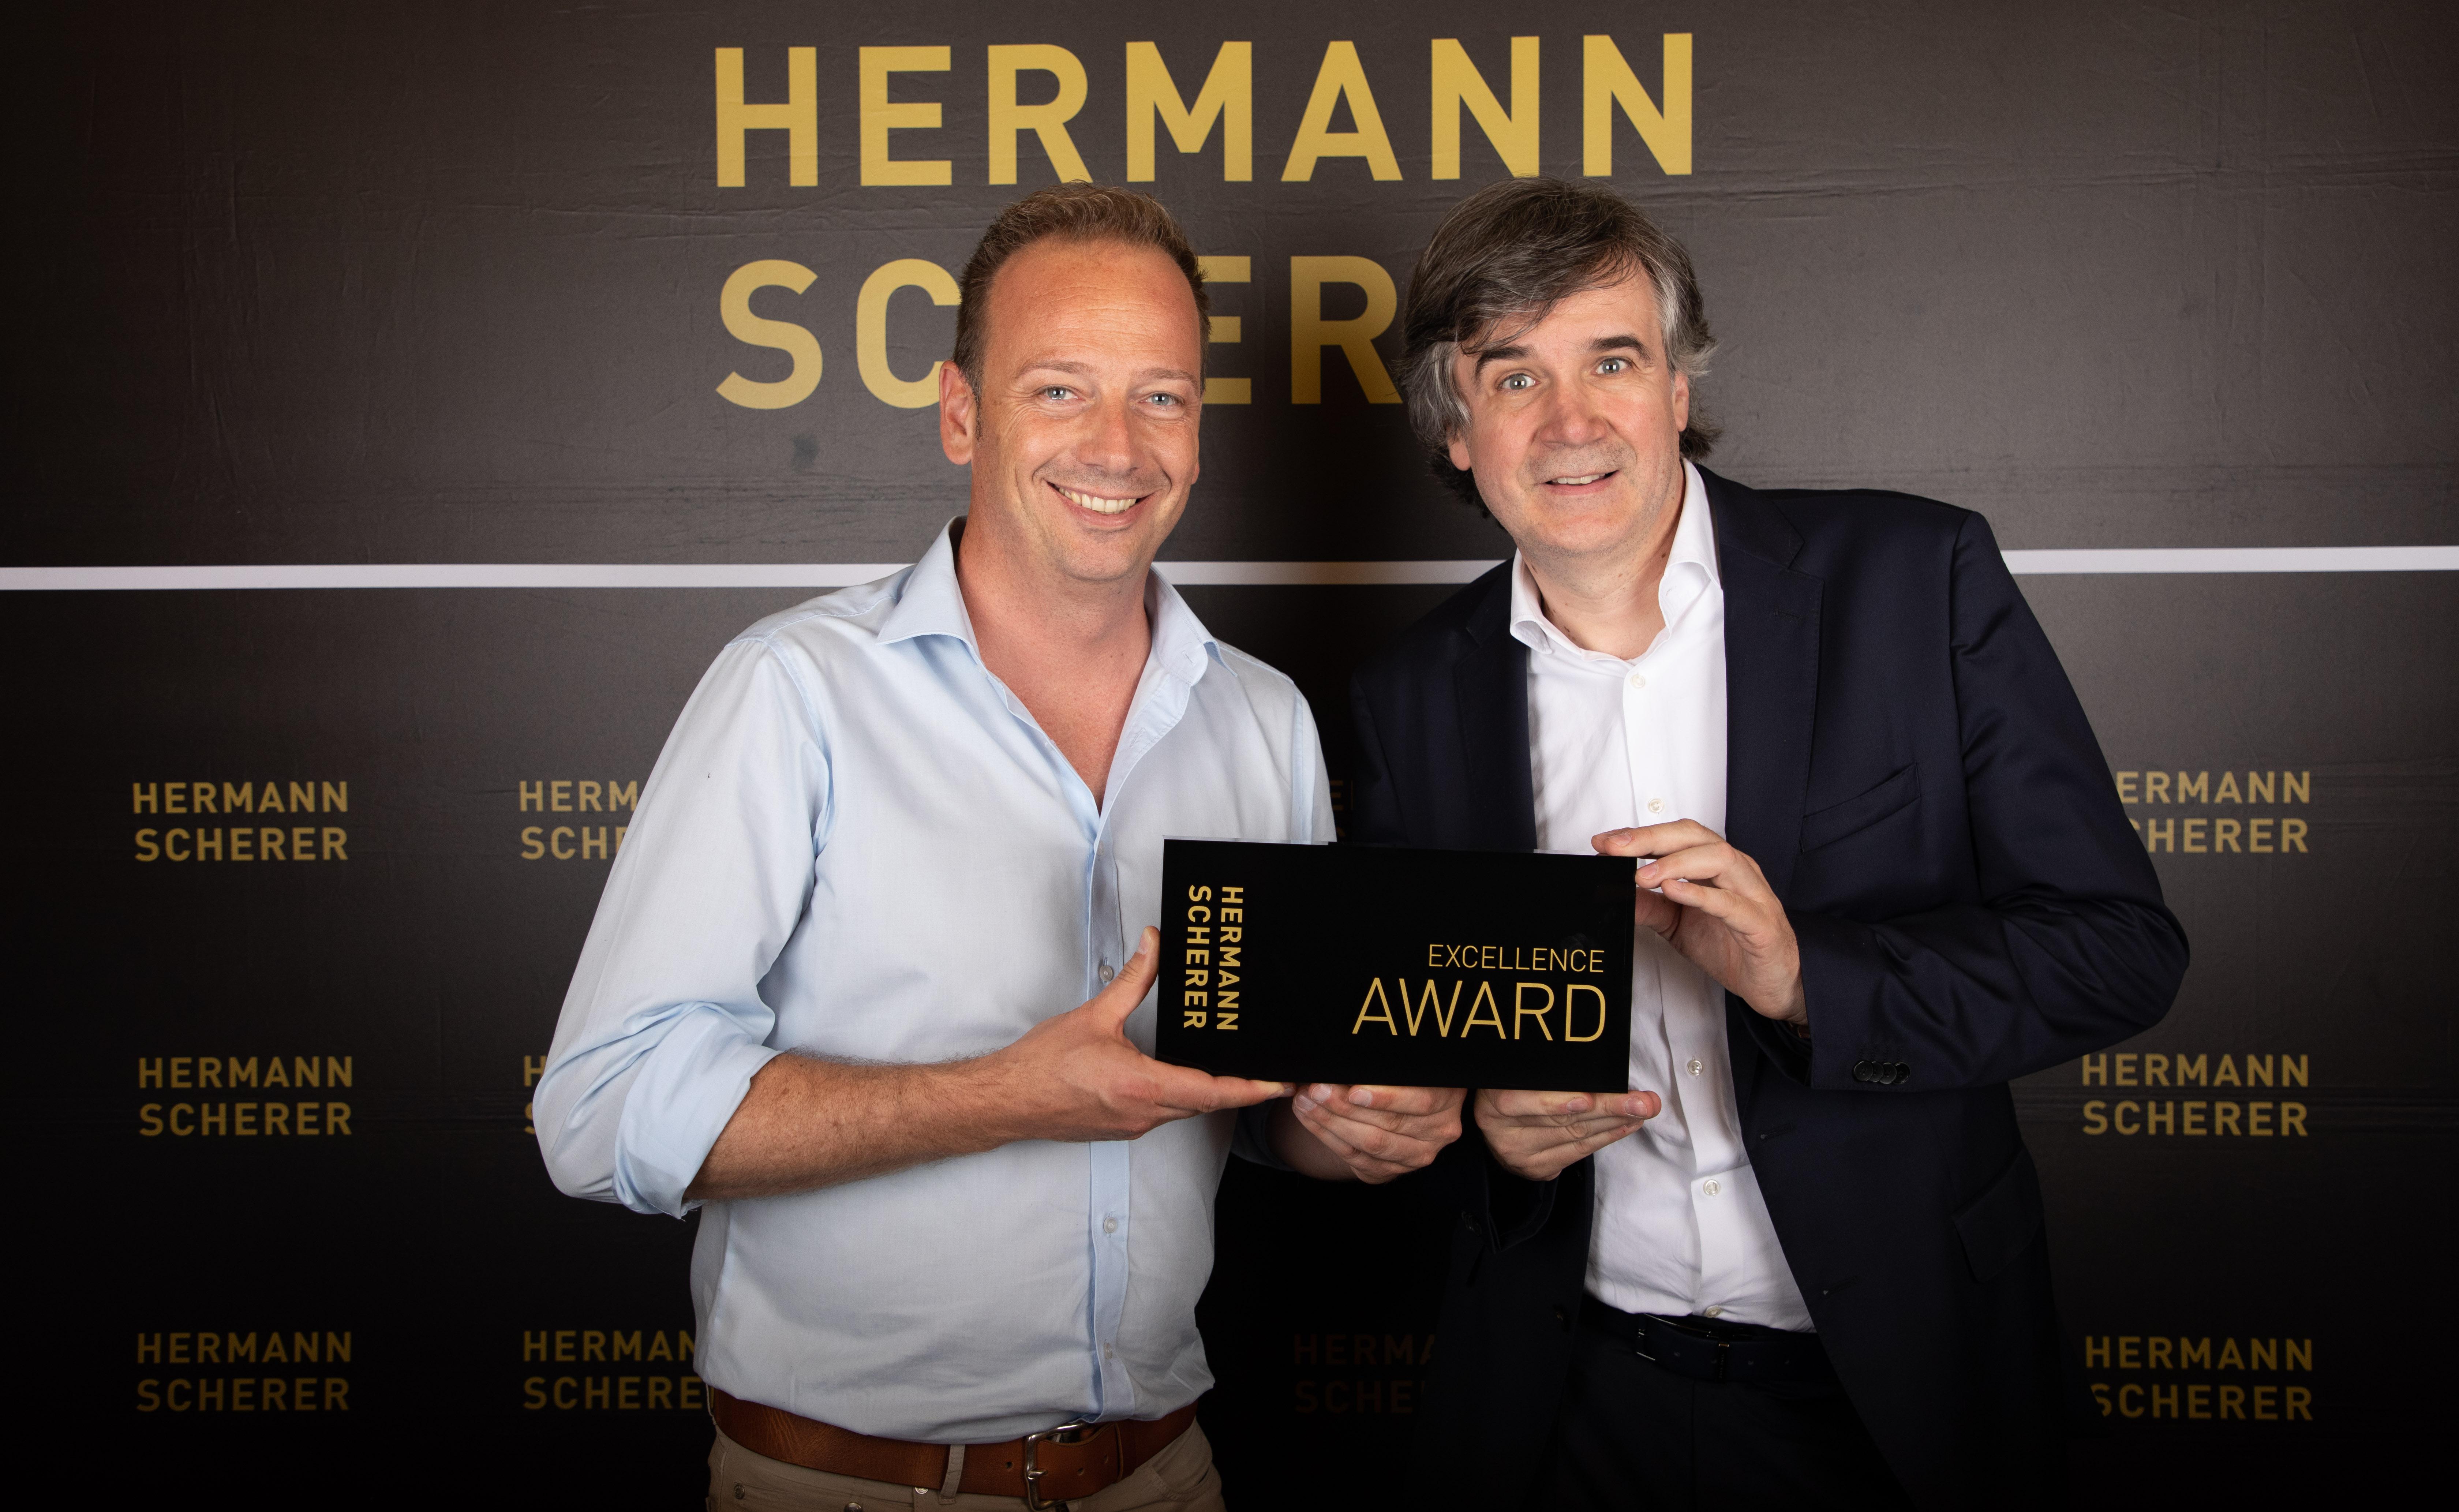 Olaf Schild, Herrmann Scherer, Excellence Award